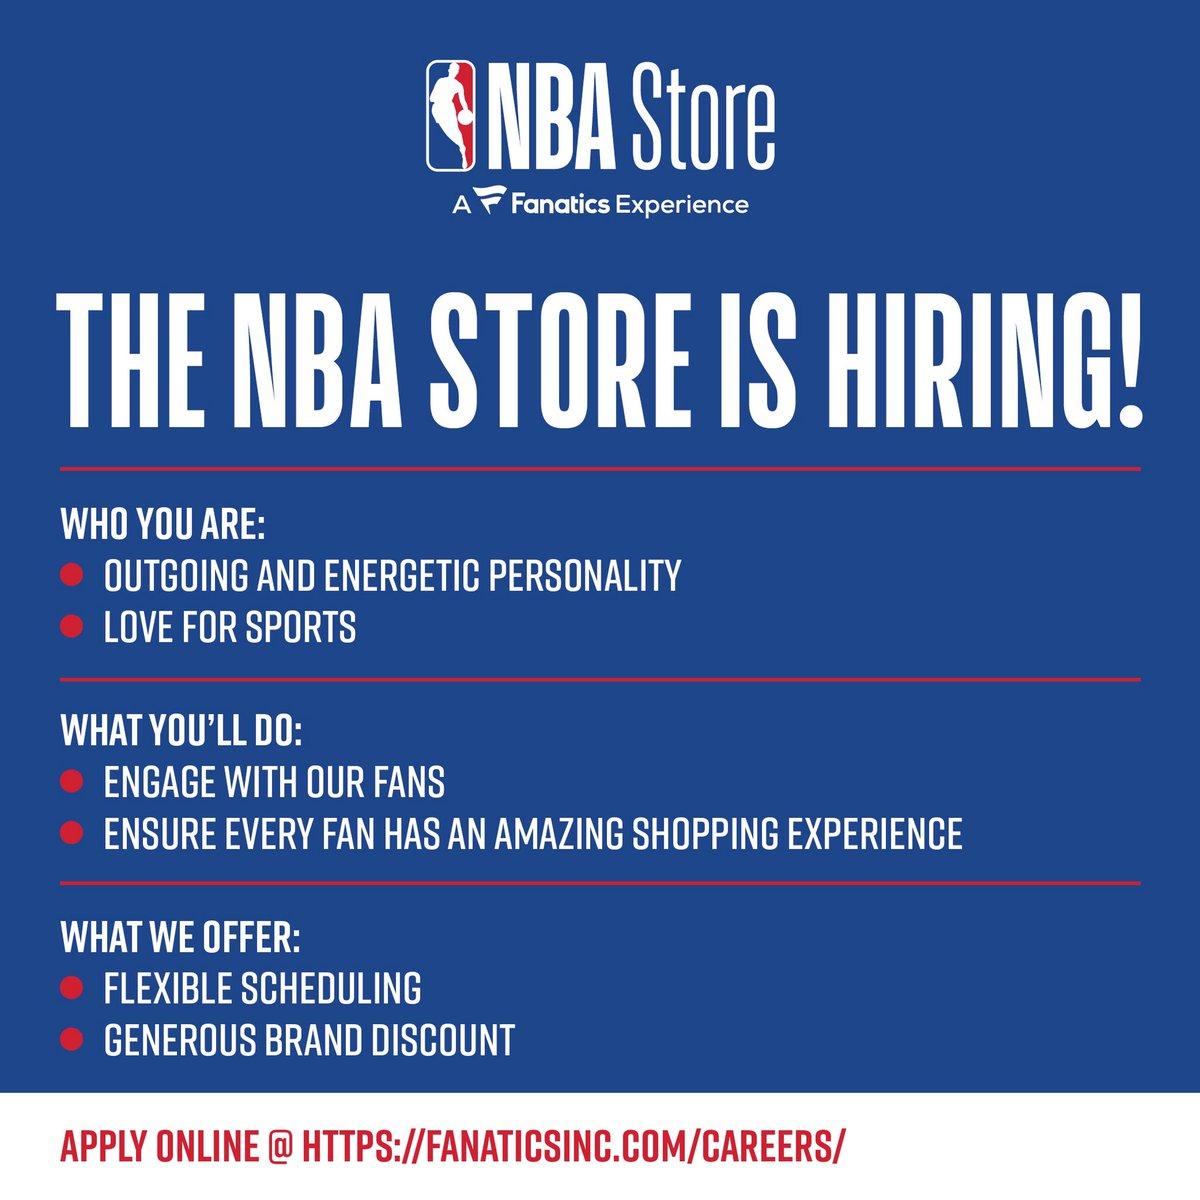 We are hiring! Apply Online @ fanaticsinc.com/careers/